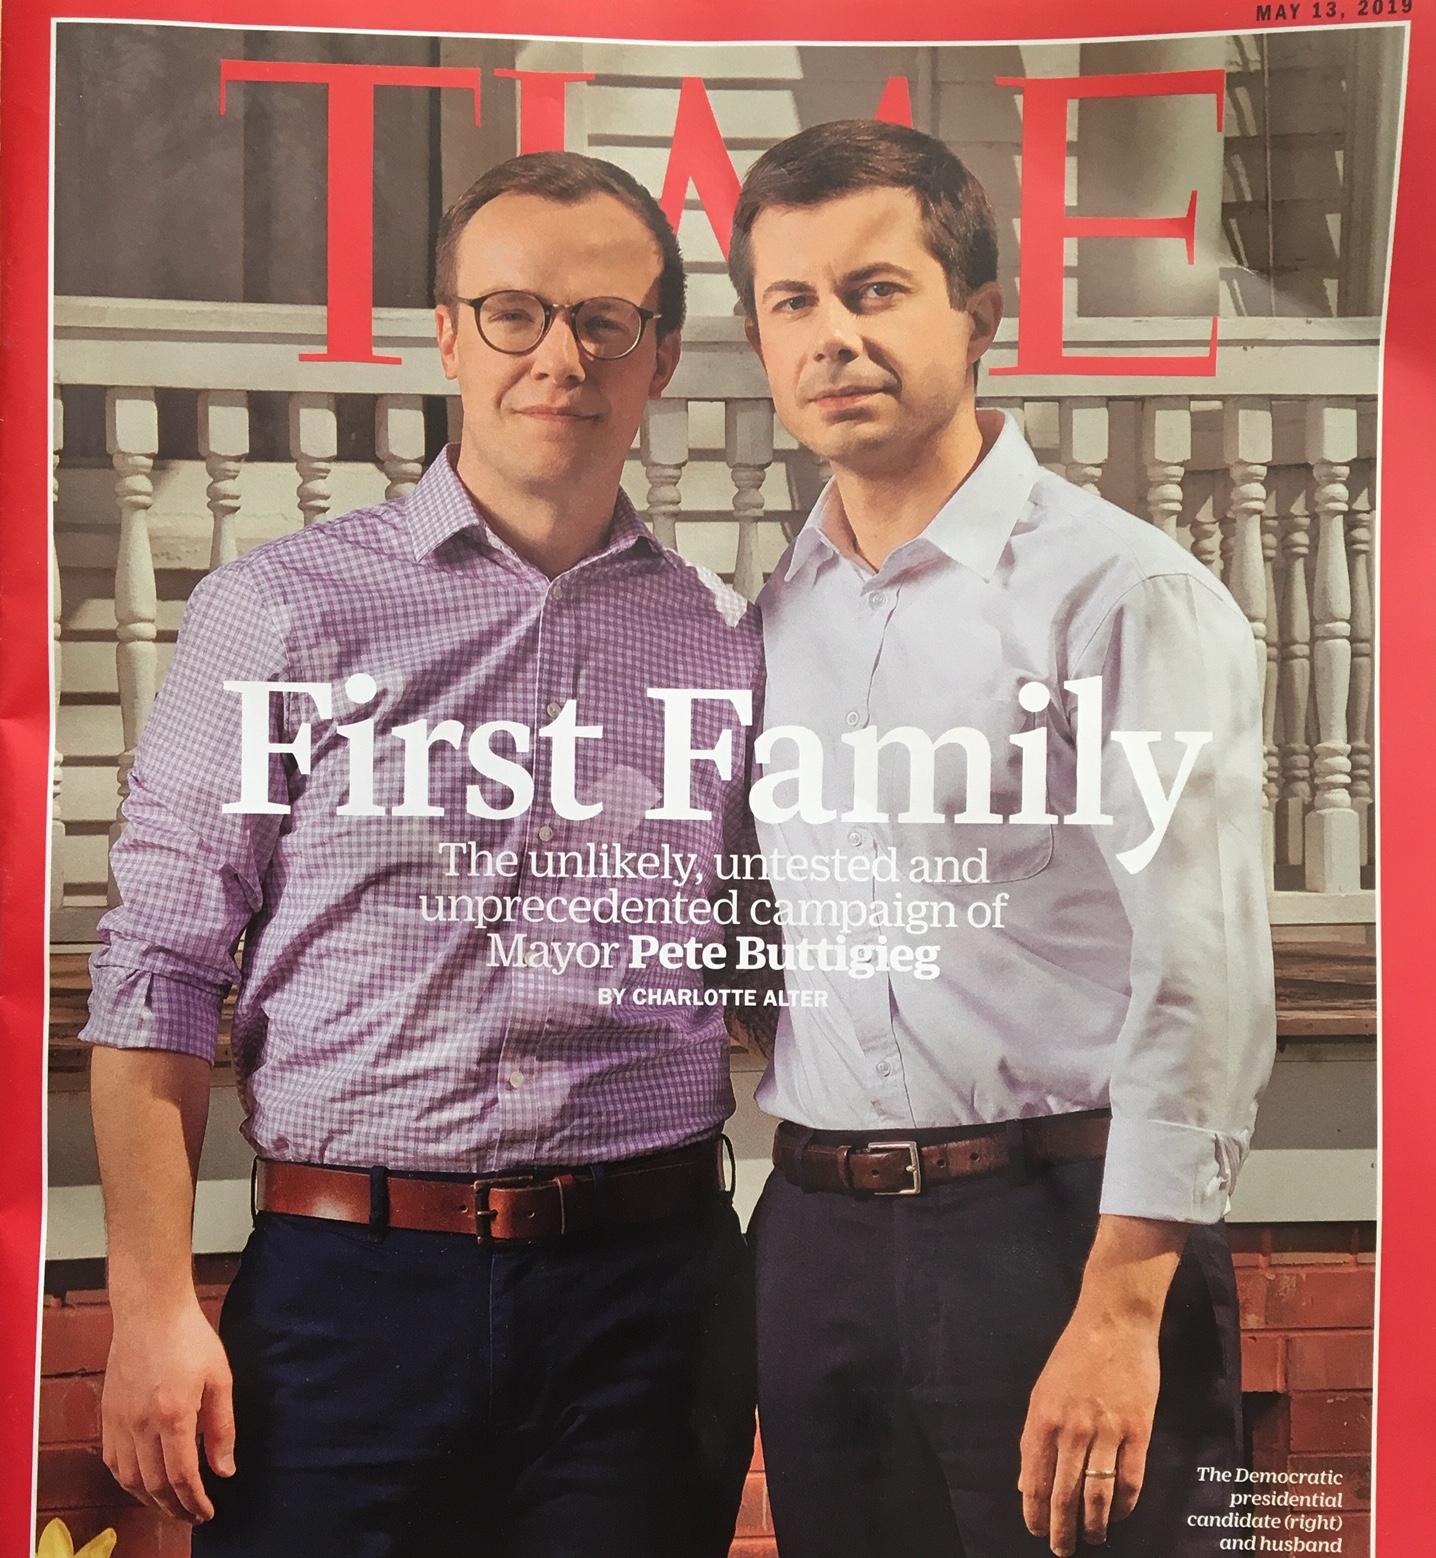 Buttigieg Time cover May2019.jpg